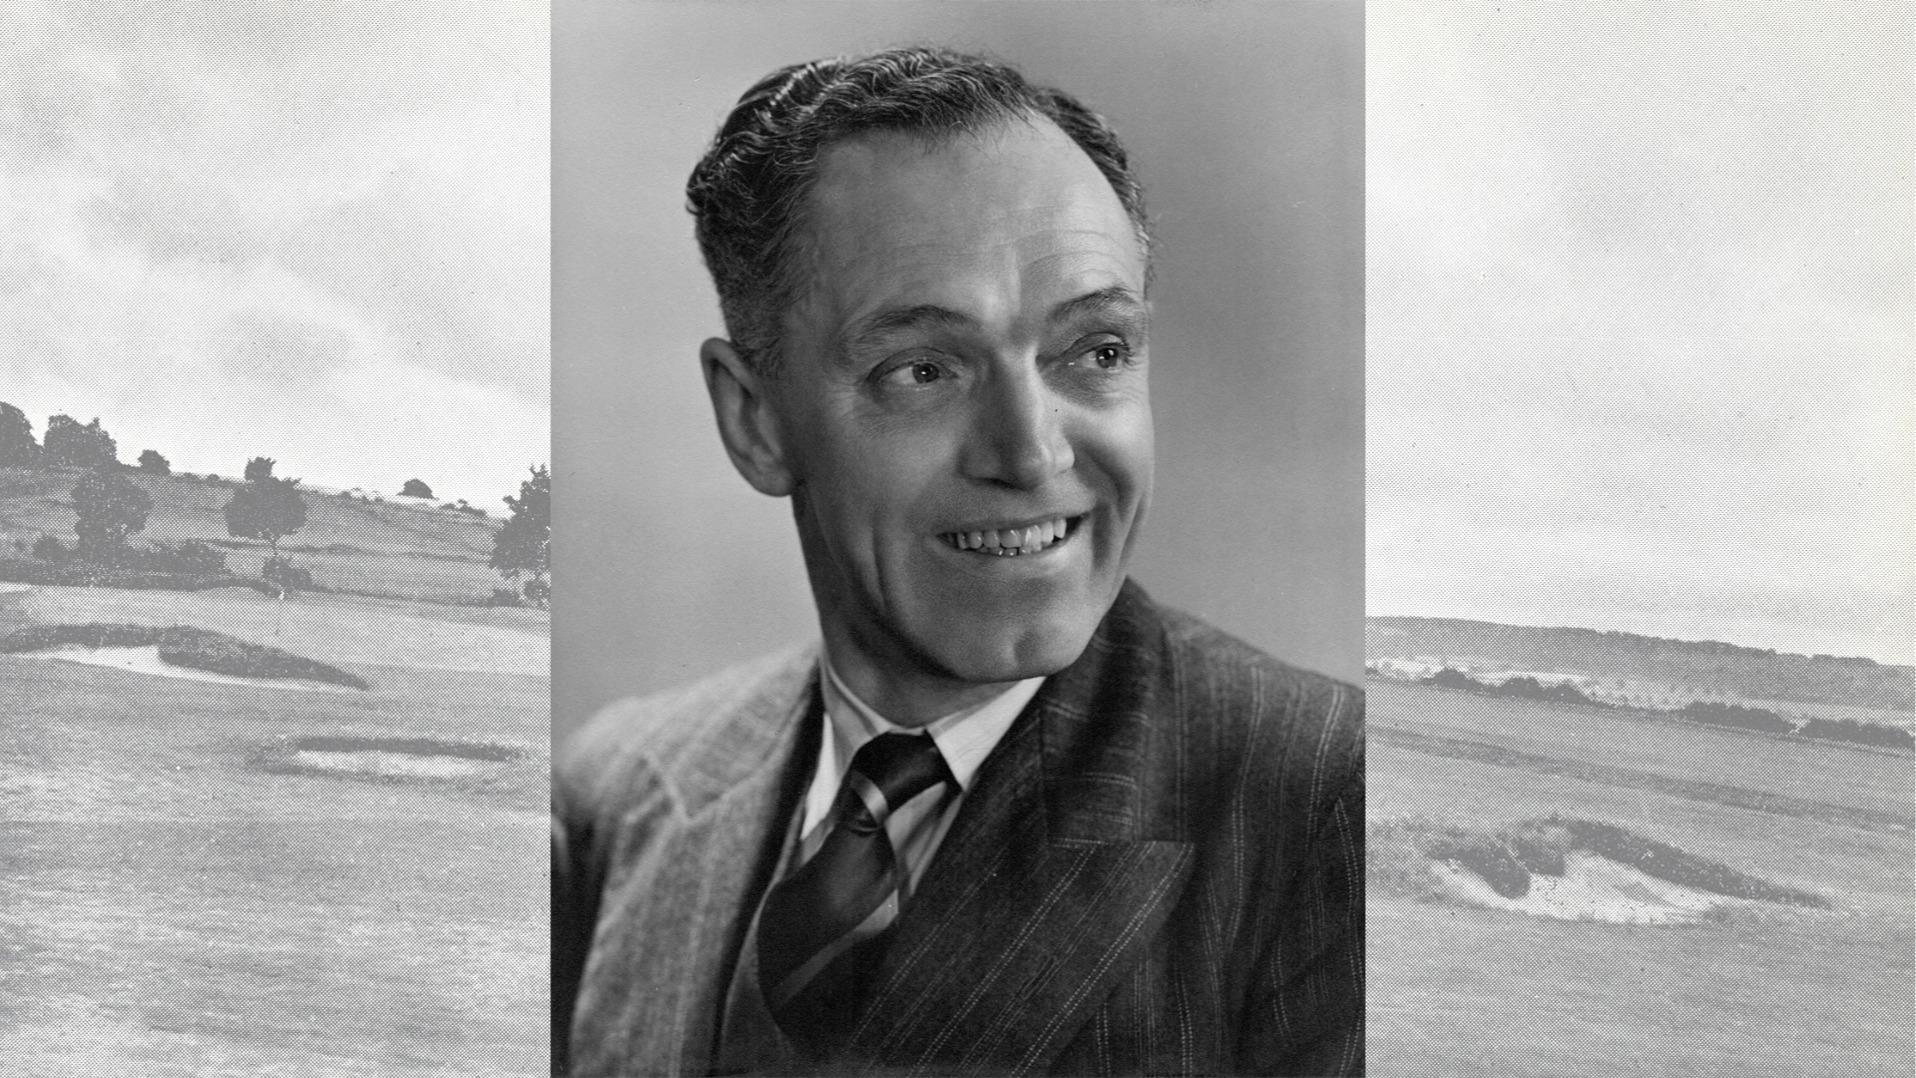 1947 - R A Howard